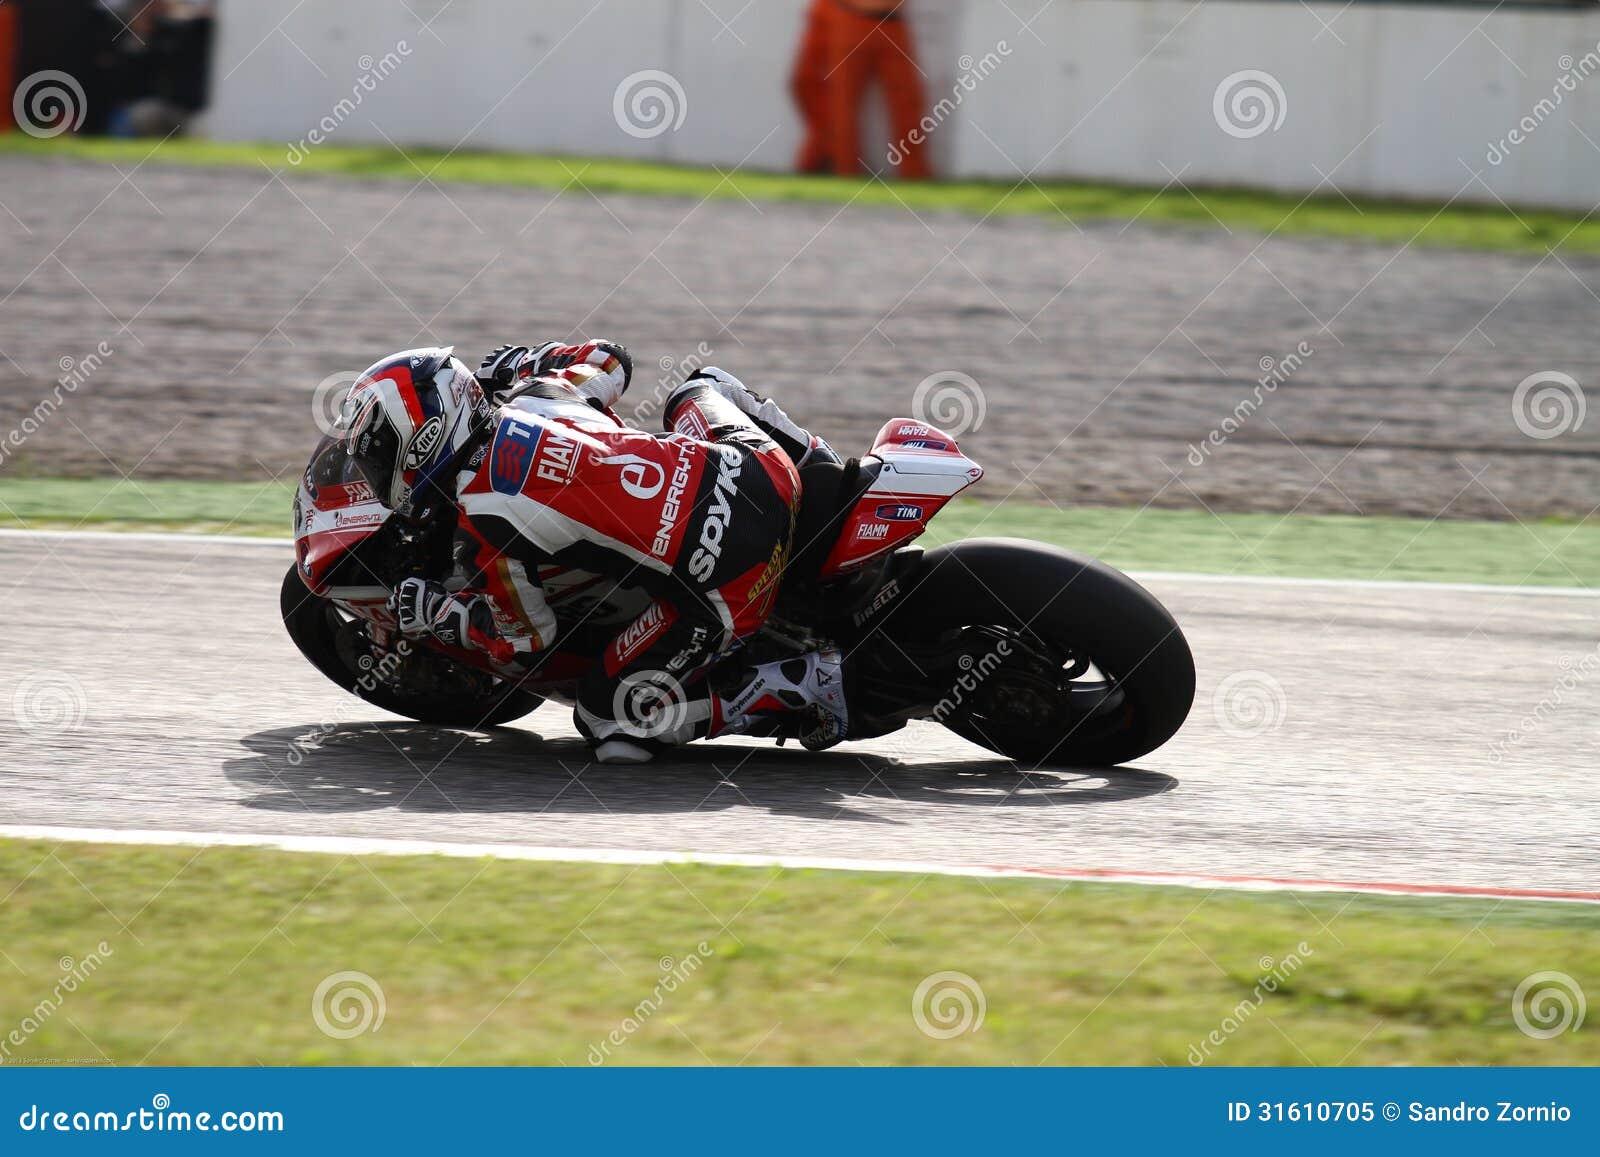 Ayrton Badovini #86 on Ducati 1199 Panigale R Team Ducati Alstare Superbike WSBK